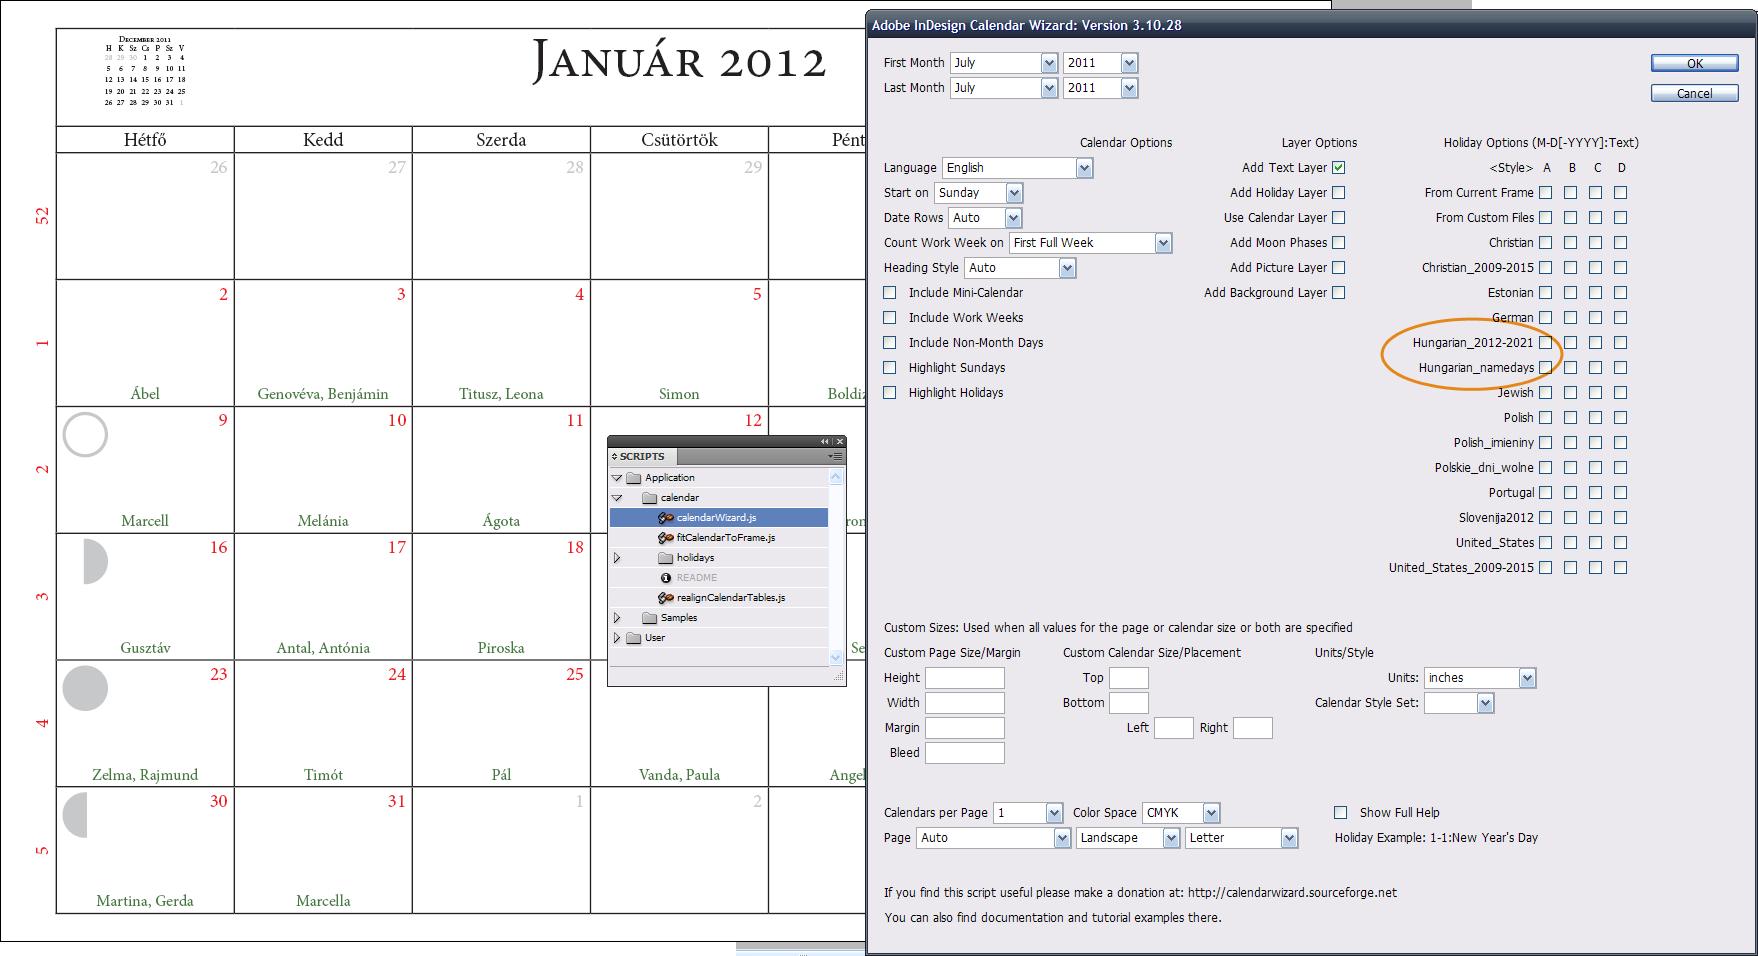 Adobe Indesign Calendar : Indesign haldesign